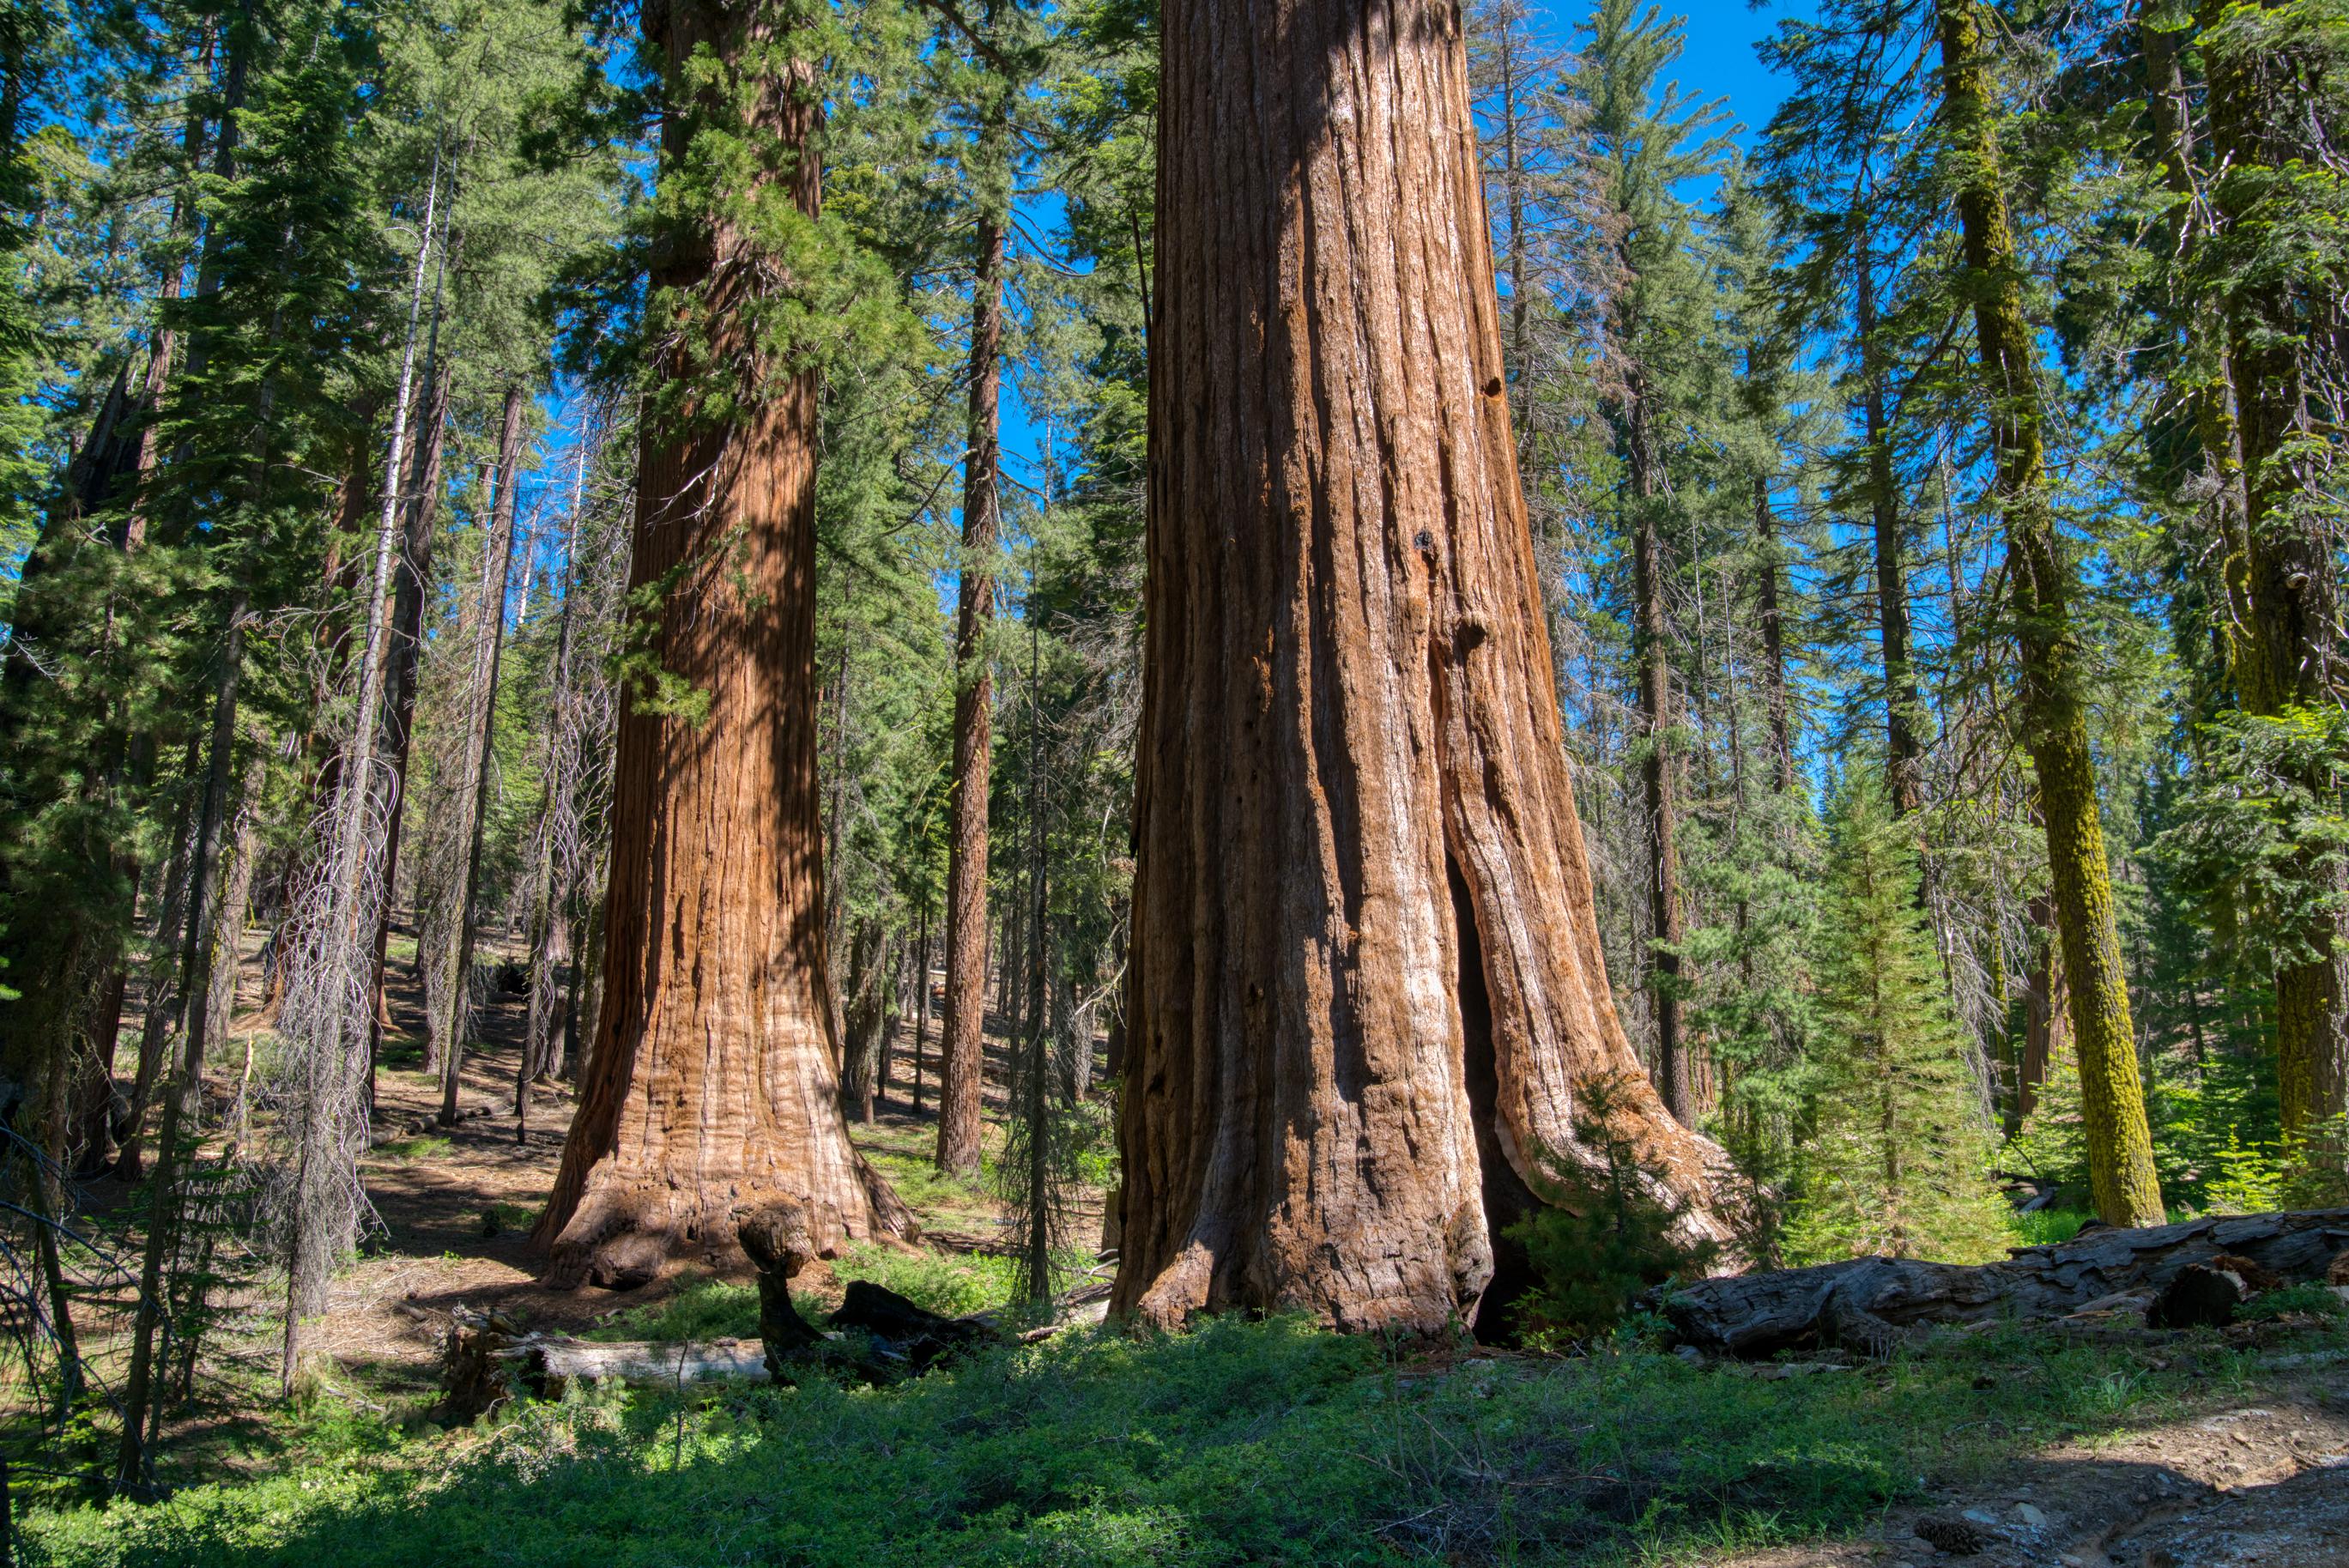 Mariposa Grove, Giant Sequoias, Hiking, Yosemite National Park